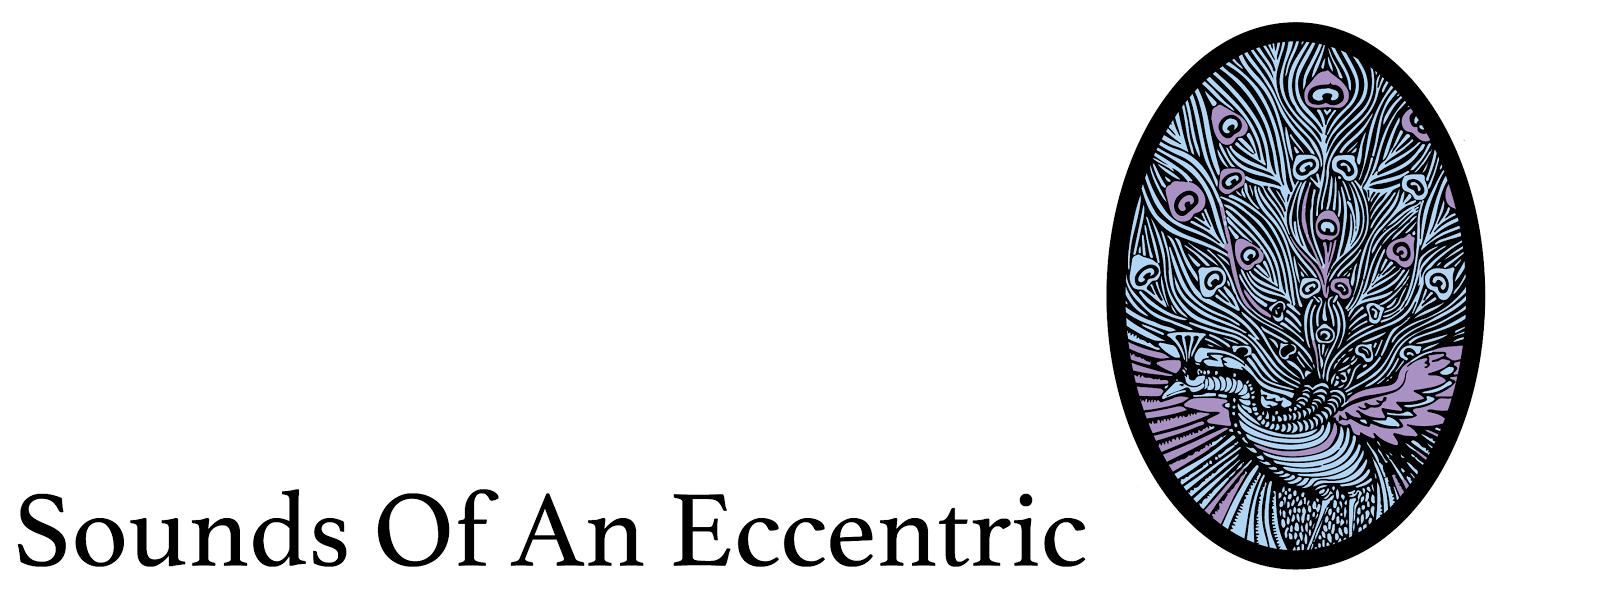 Sounds of an Eccentric